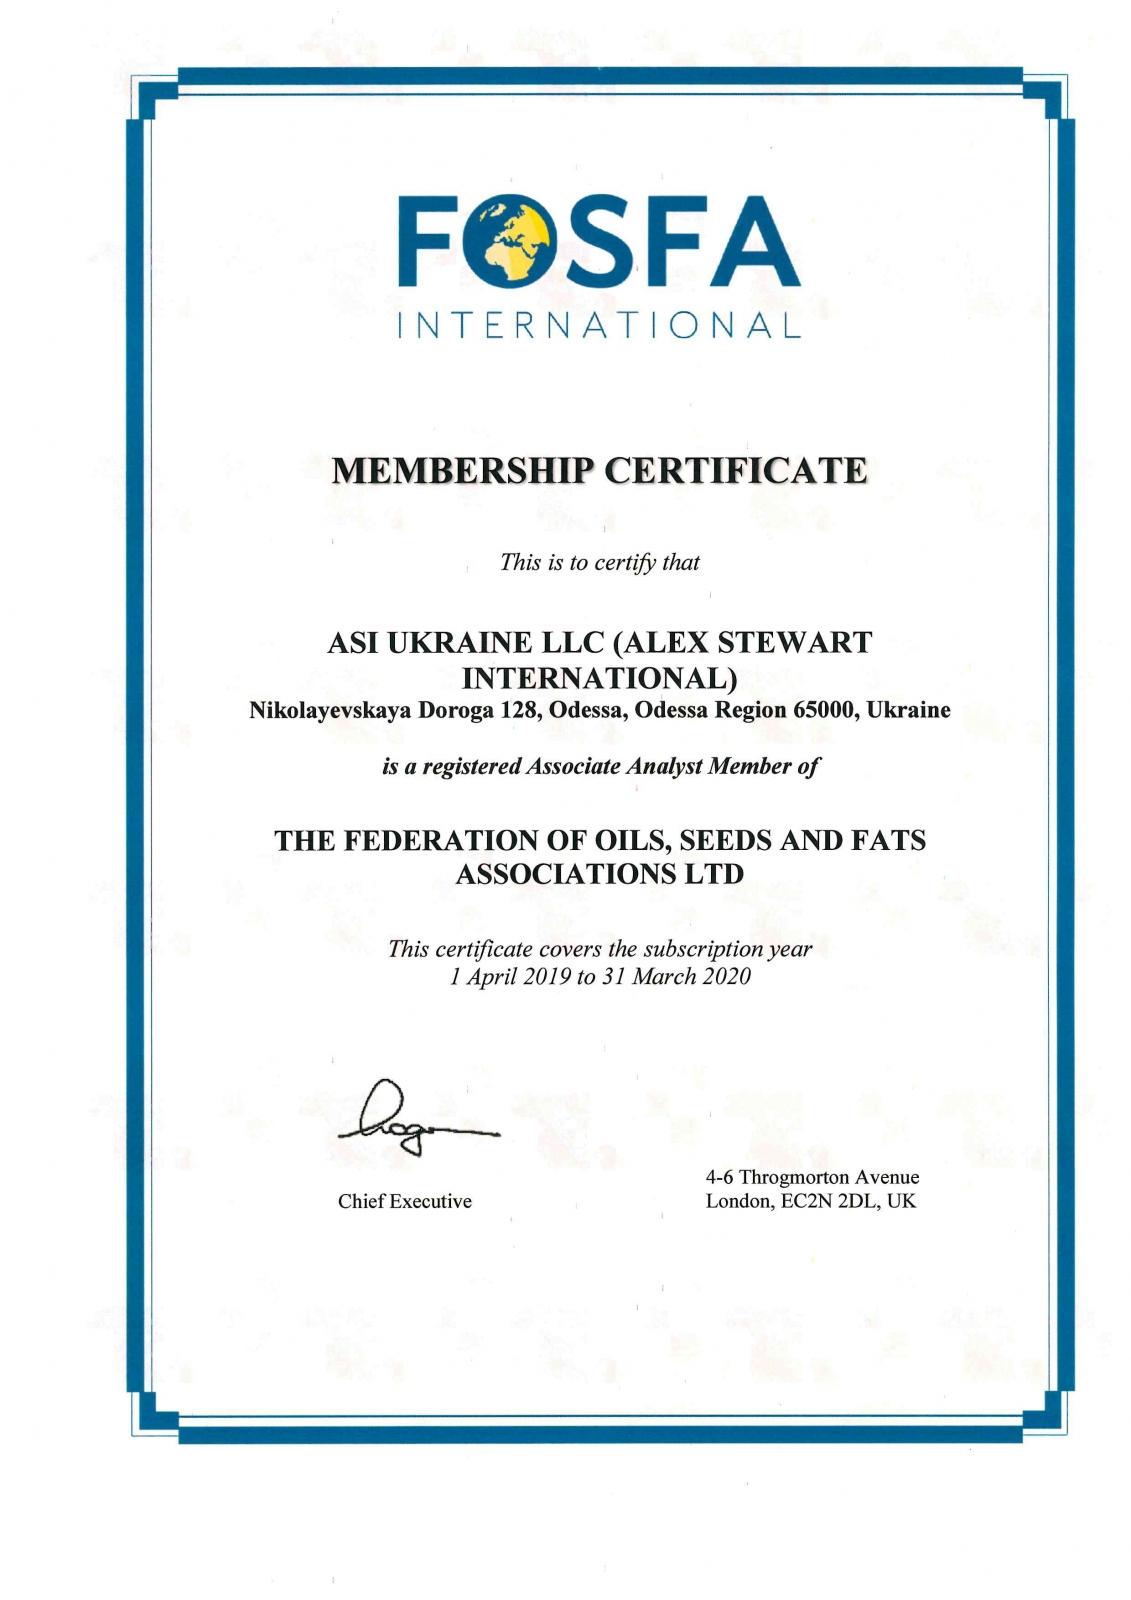 ASI Ukraine LLC FOSFA Associate Analyst Member 2019